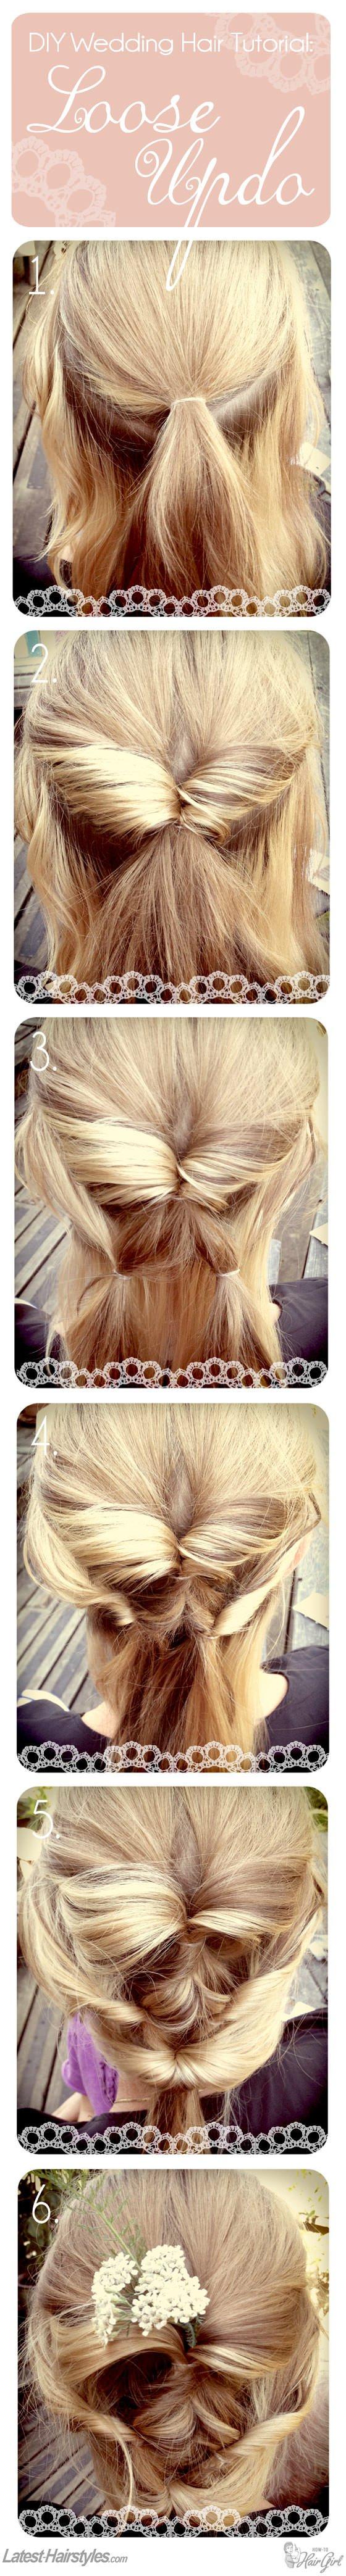 DIY wedding hair tutorial